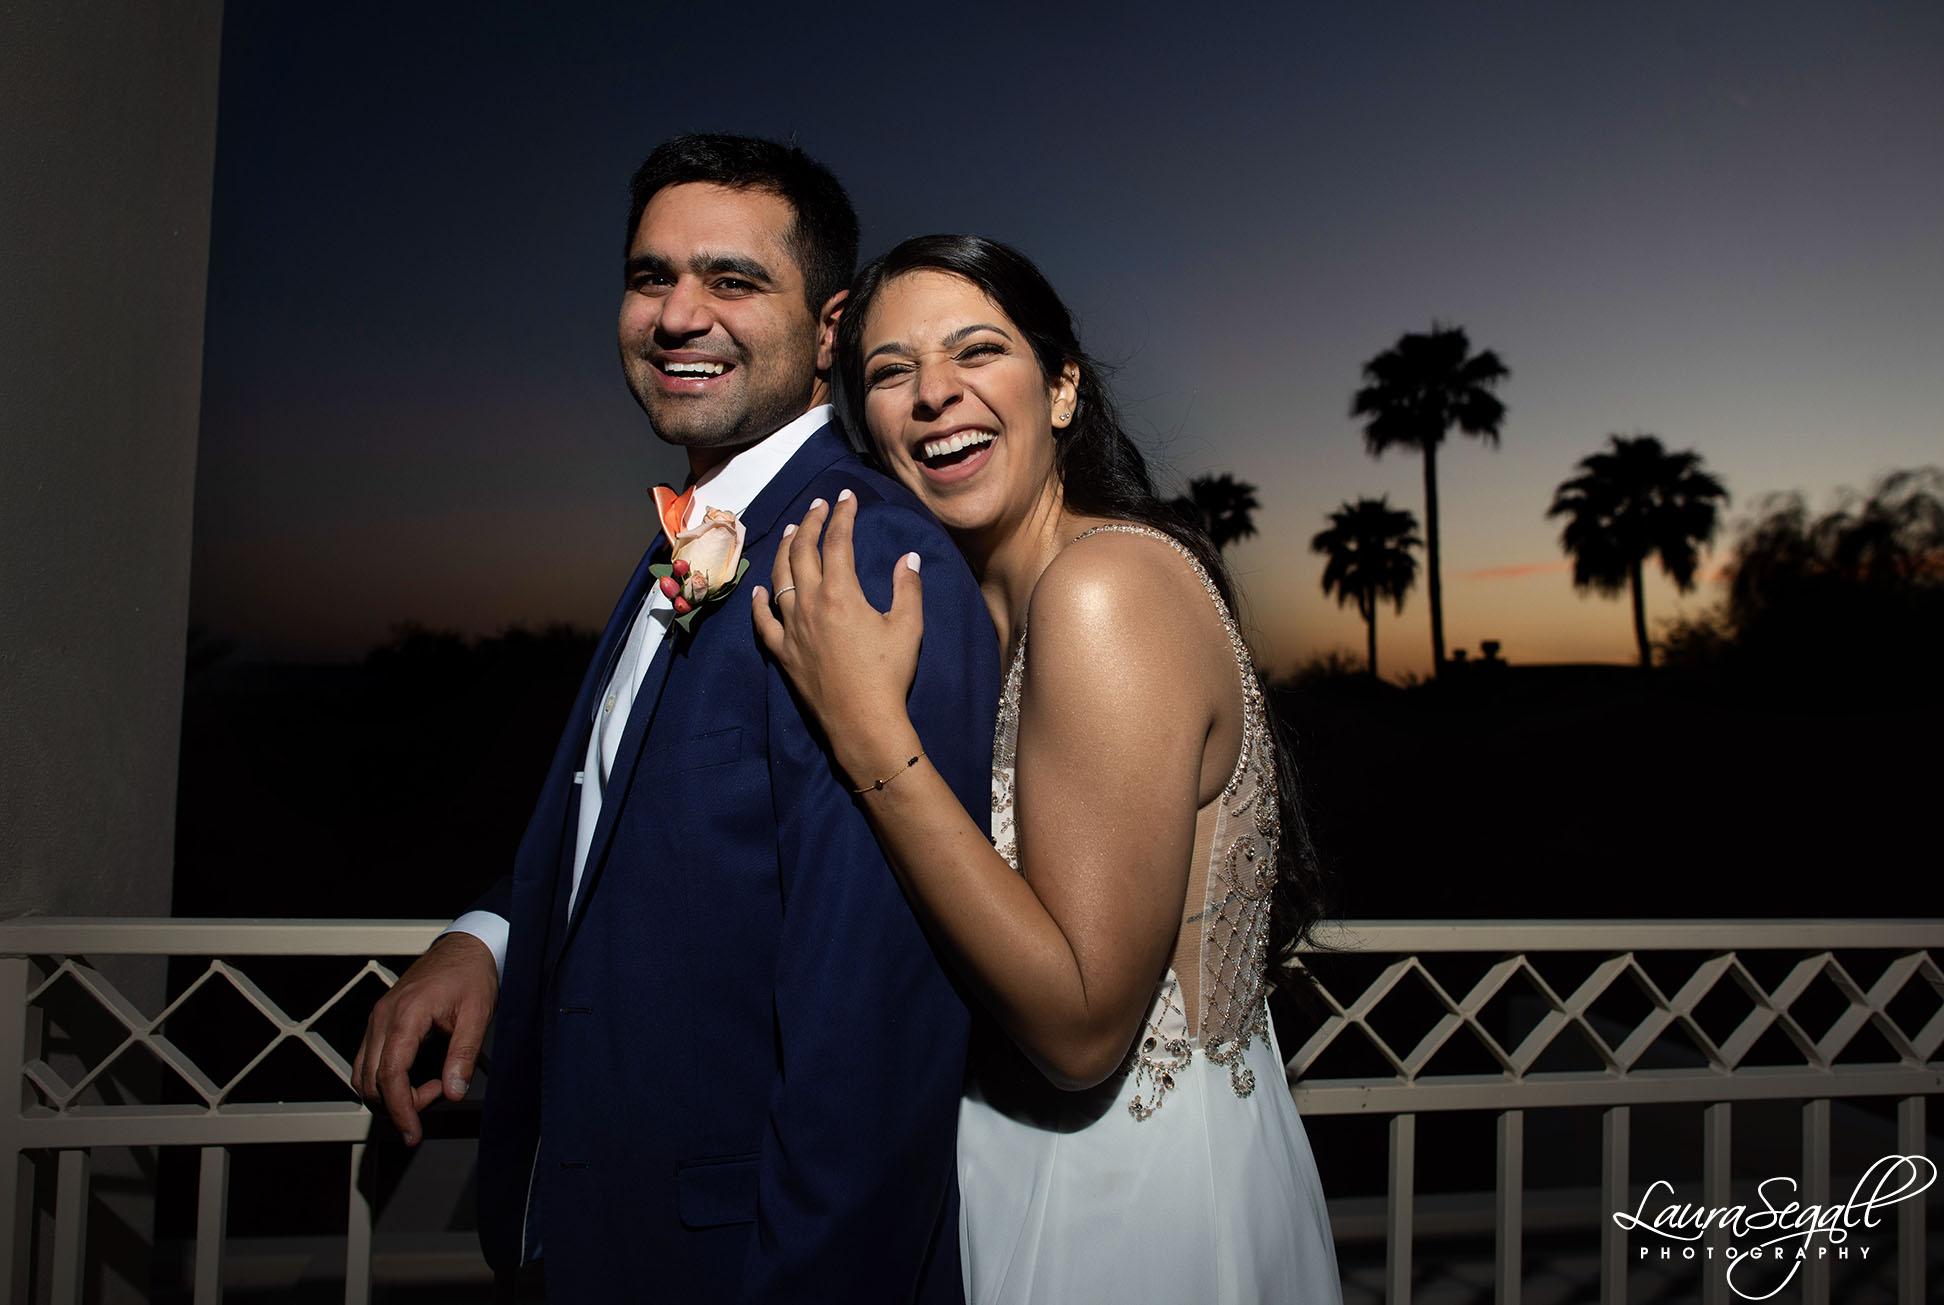 The Phoenician luxury resort Scottsdale wedding